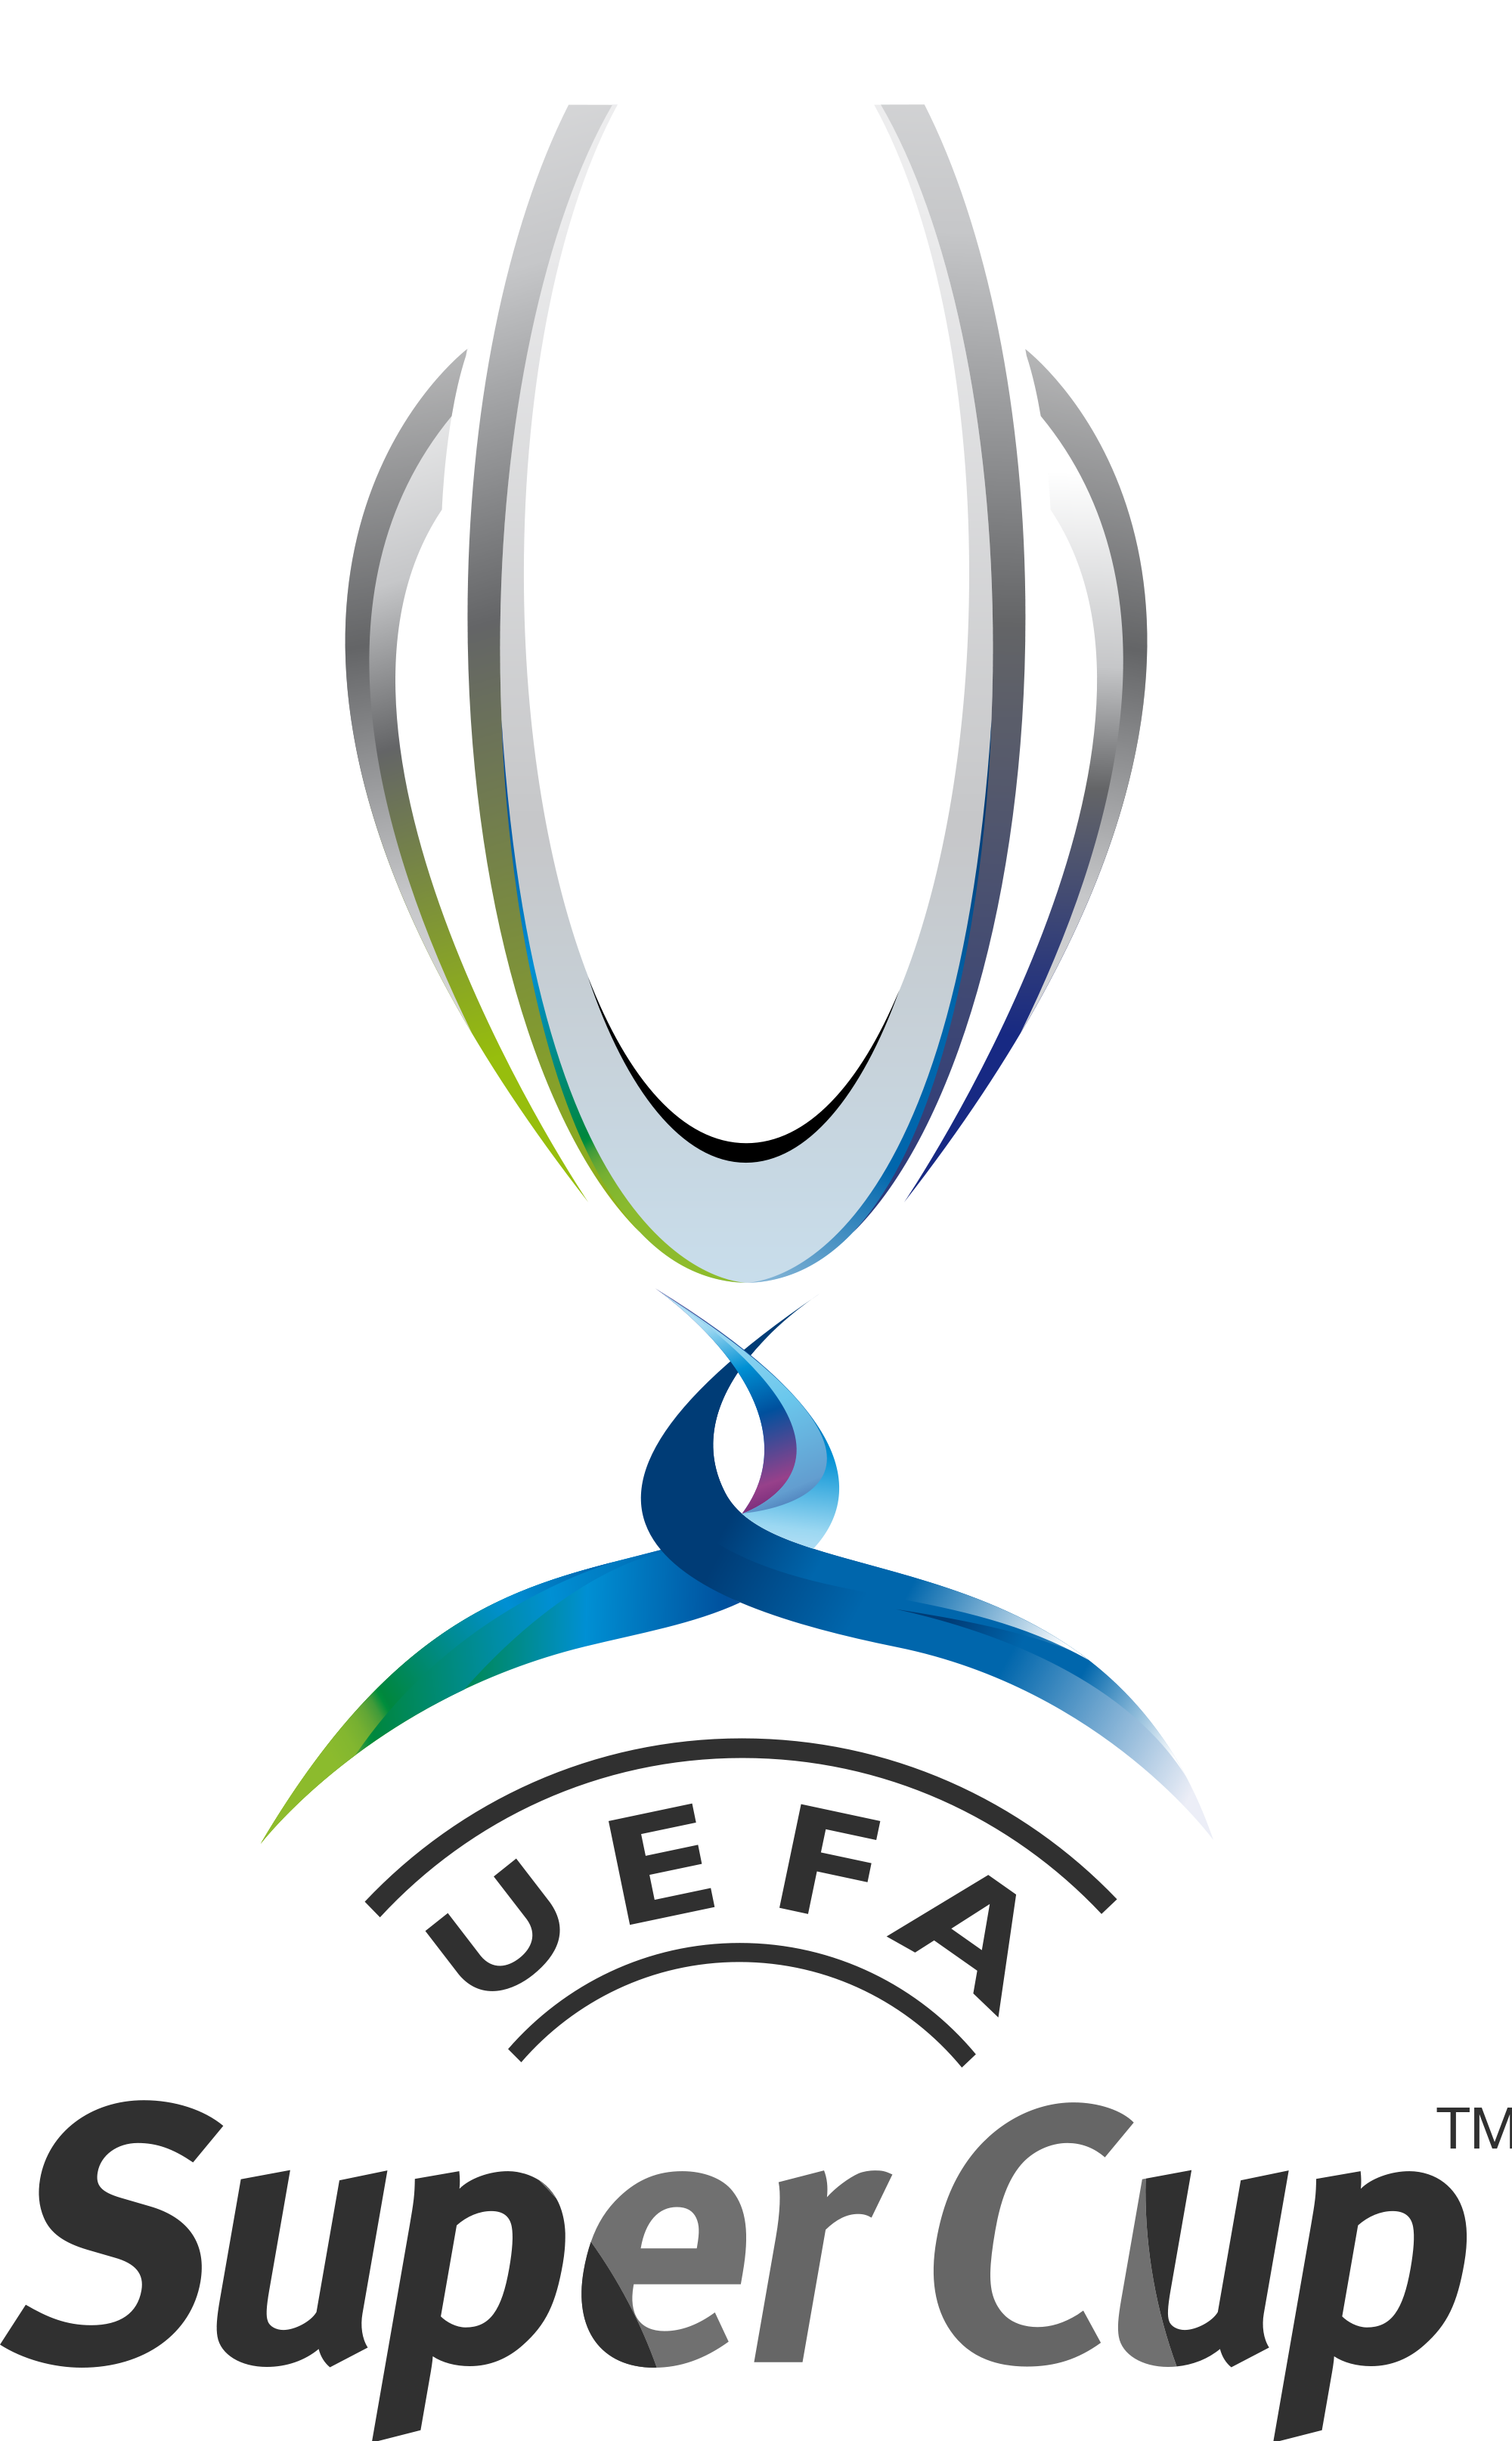 Uefa Logo 2013 Supercoppa UEFA 2013 -...